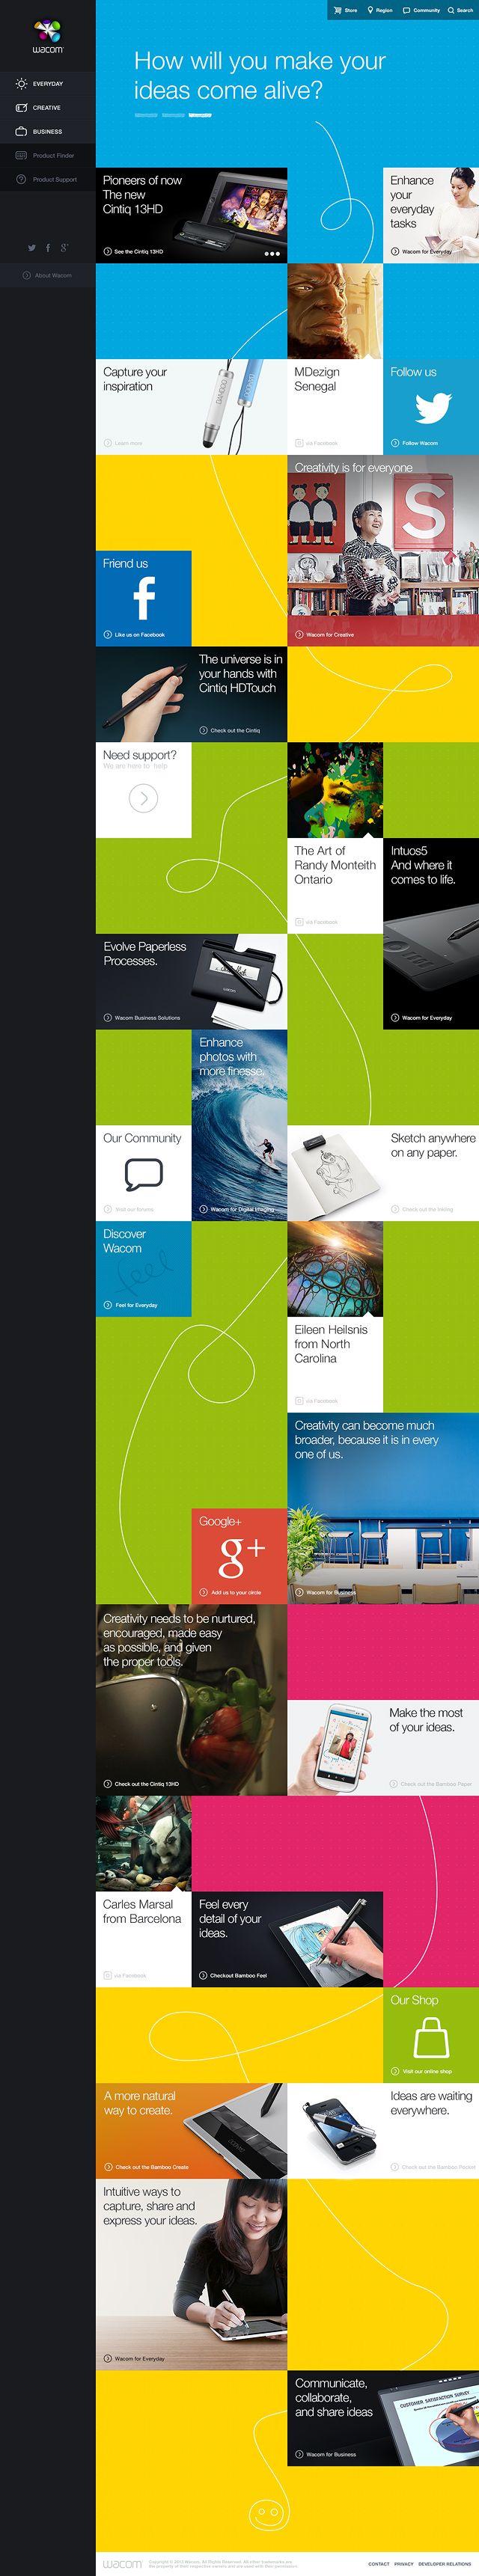 Wacom product website #webdesign #UI #navigation